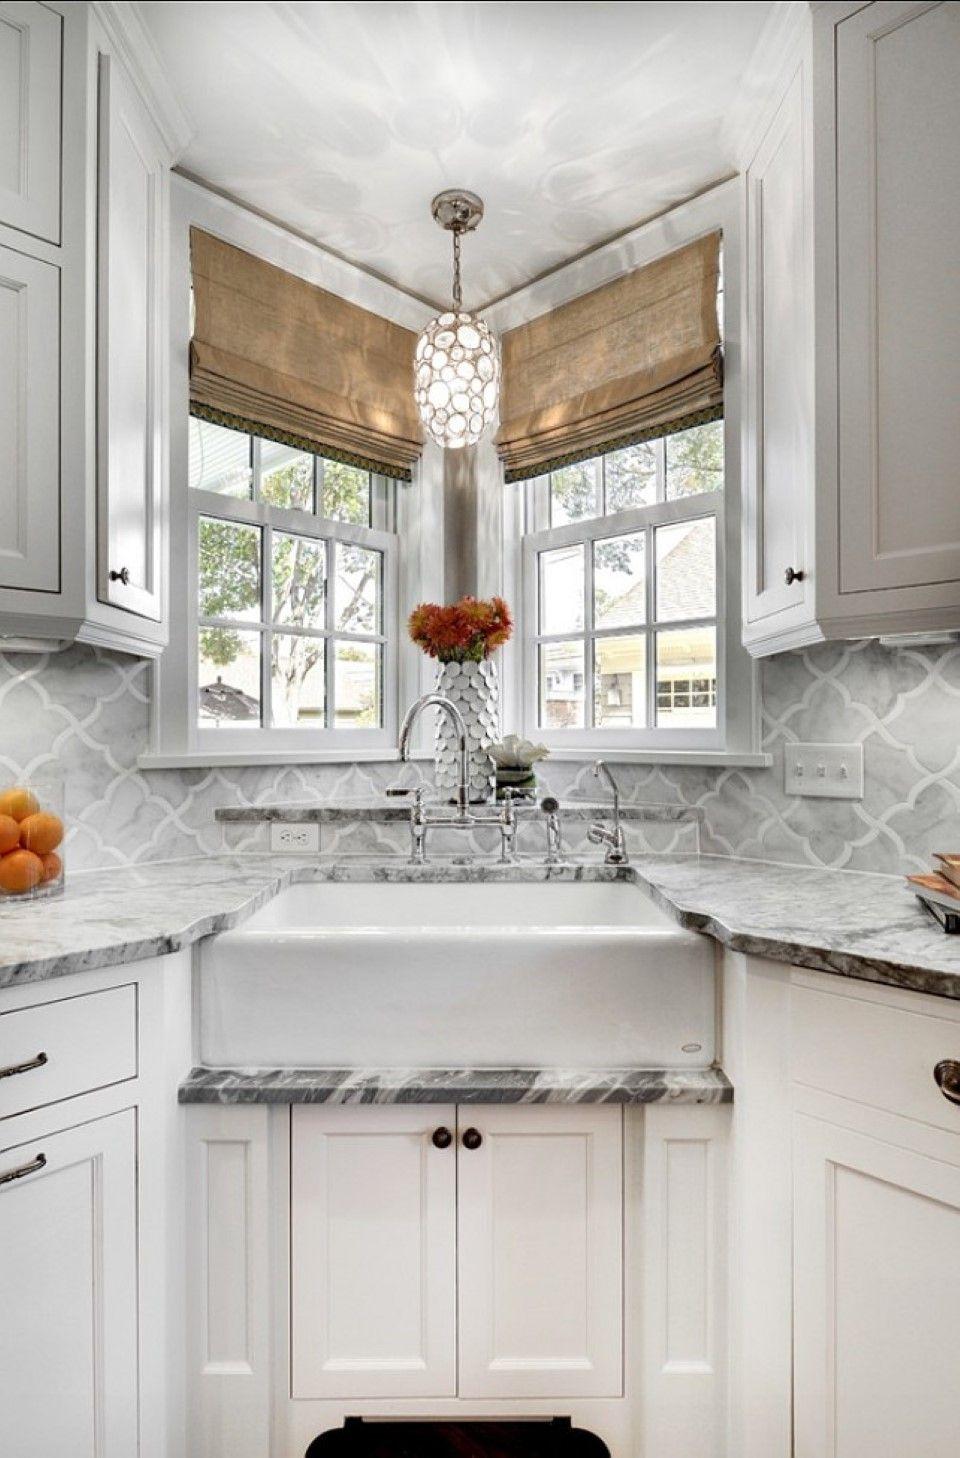 Corner Farmhouse Sink Kitchen Romanian Window Blind Ideas With Catchy Backsplash Tile